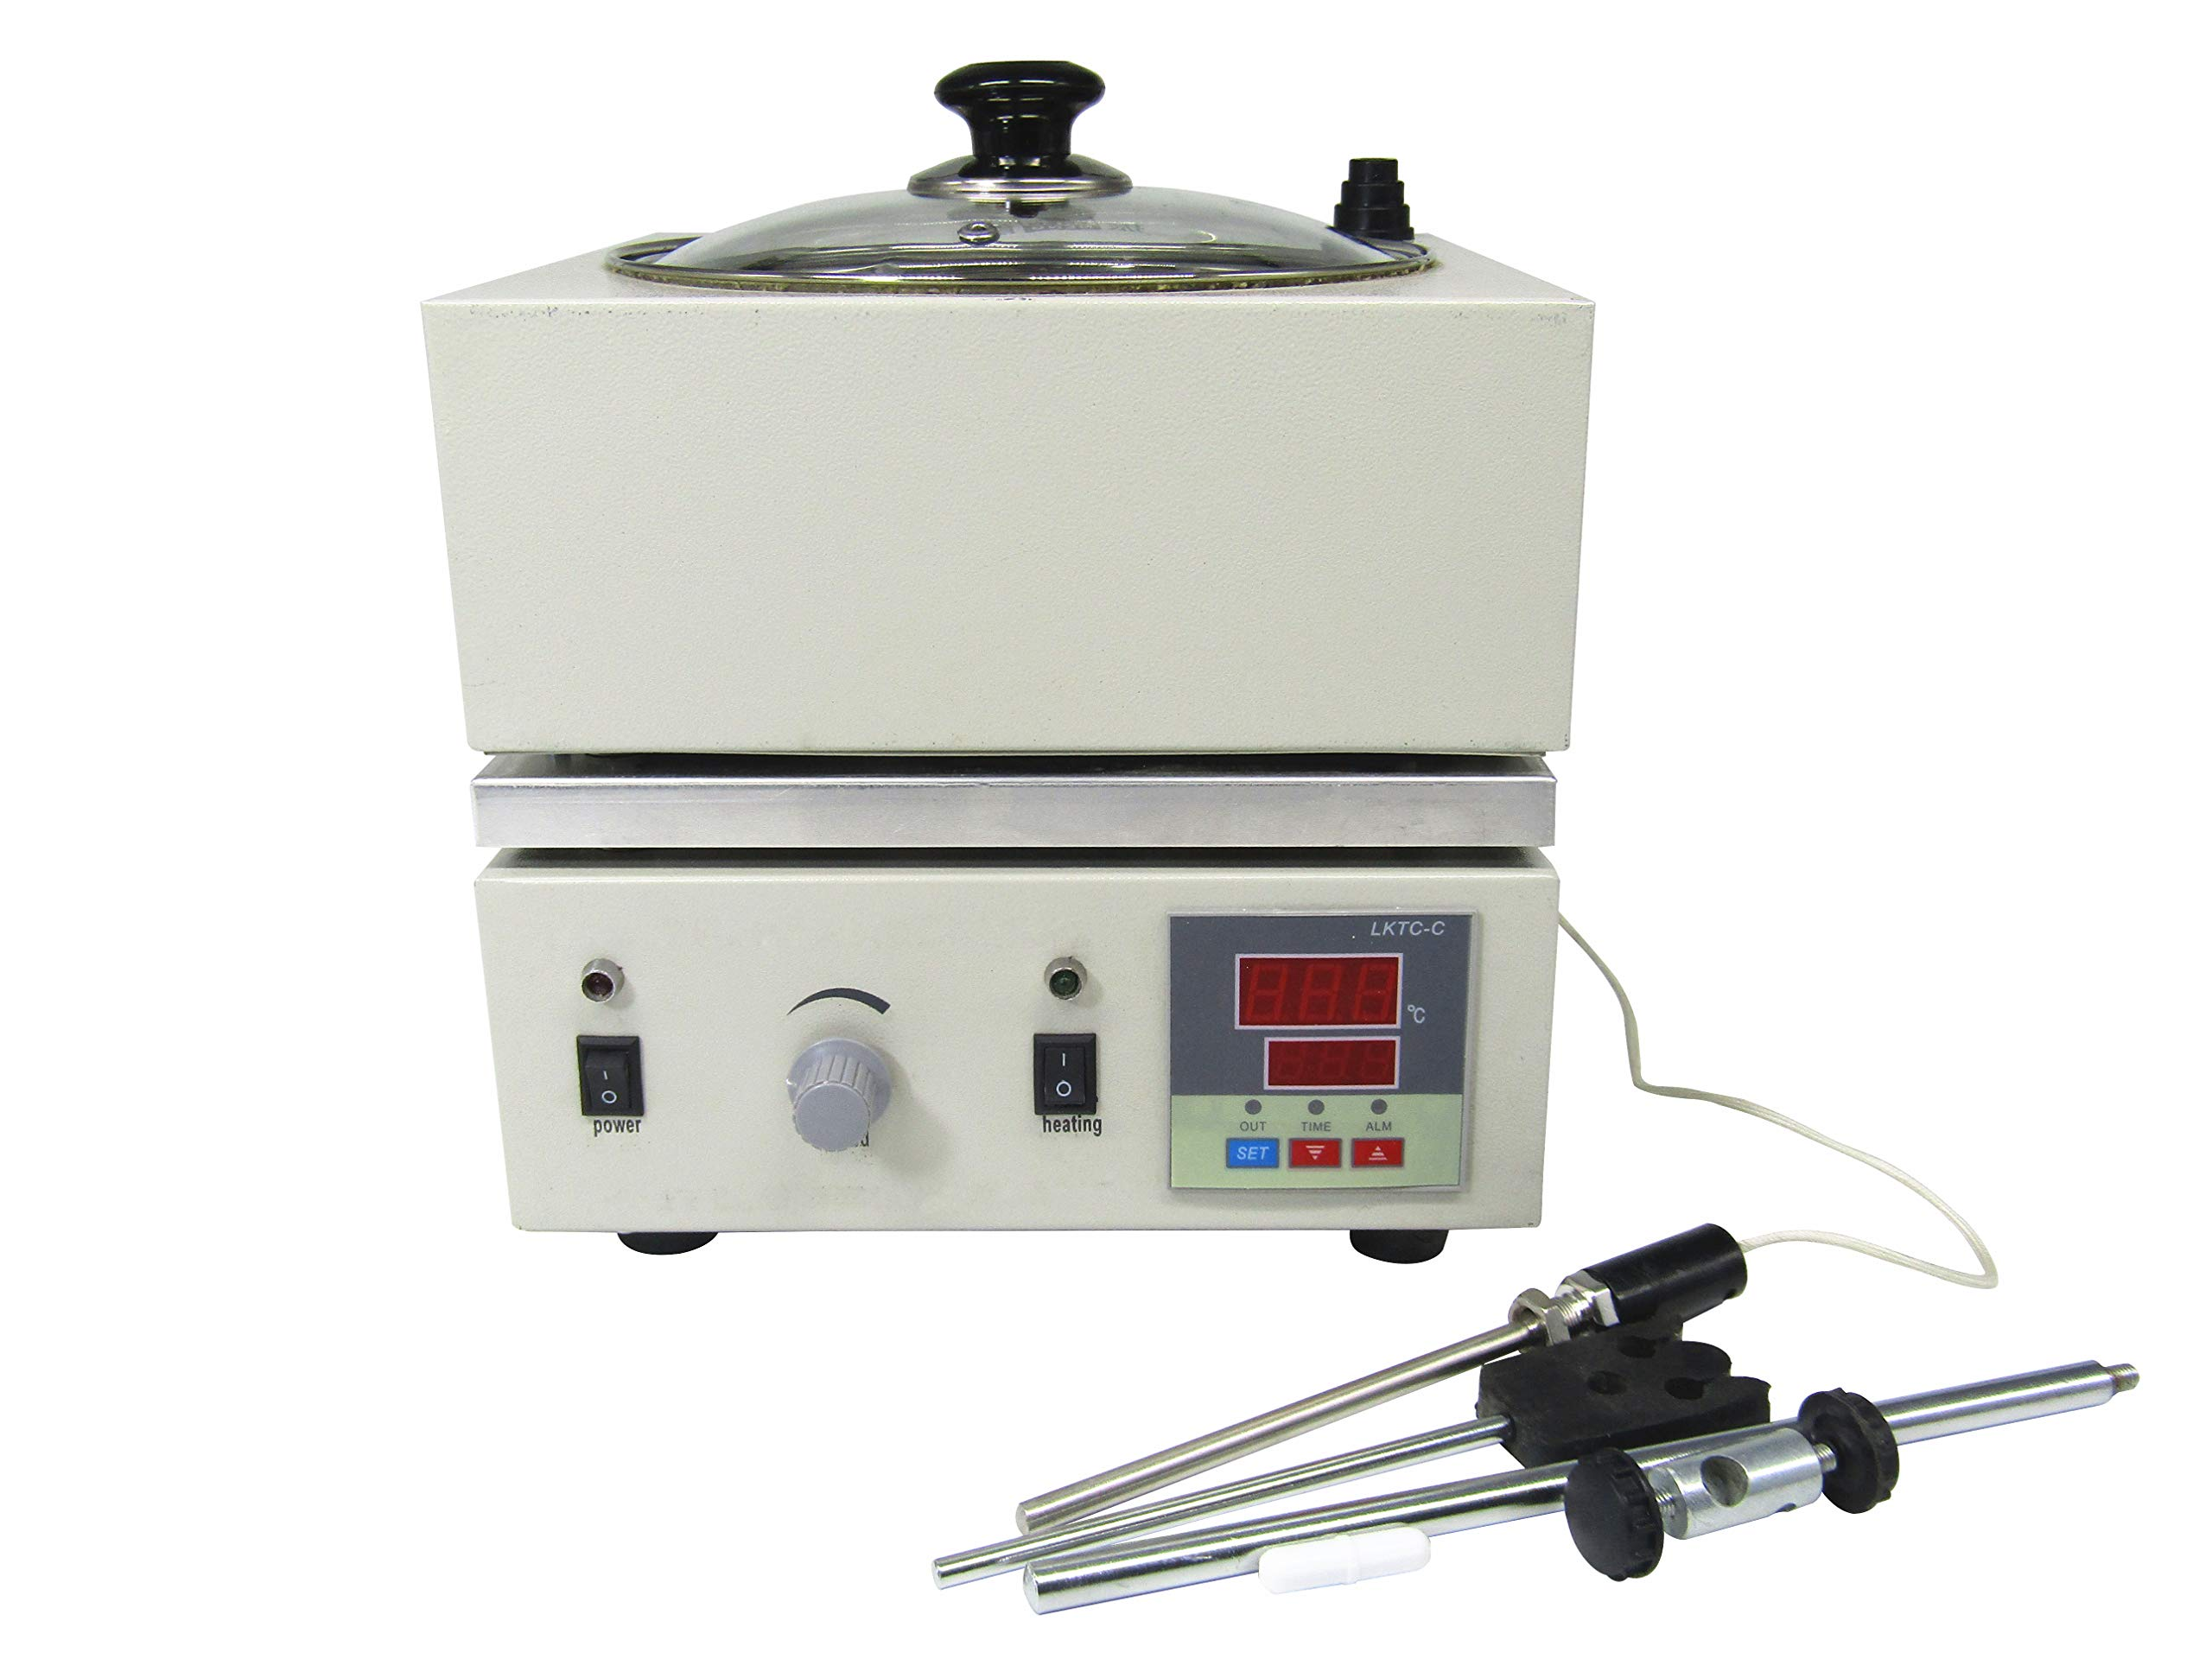 YUCHENGTECH Digital Magnetic Stirrer Mixer Water Oil Bath Heat-gathering Thermostat 300°C 2000ML (110V) by YUCHENGTECH (Image #5)